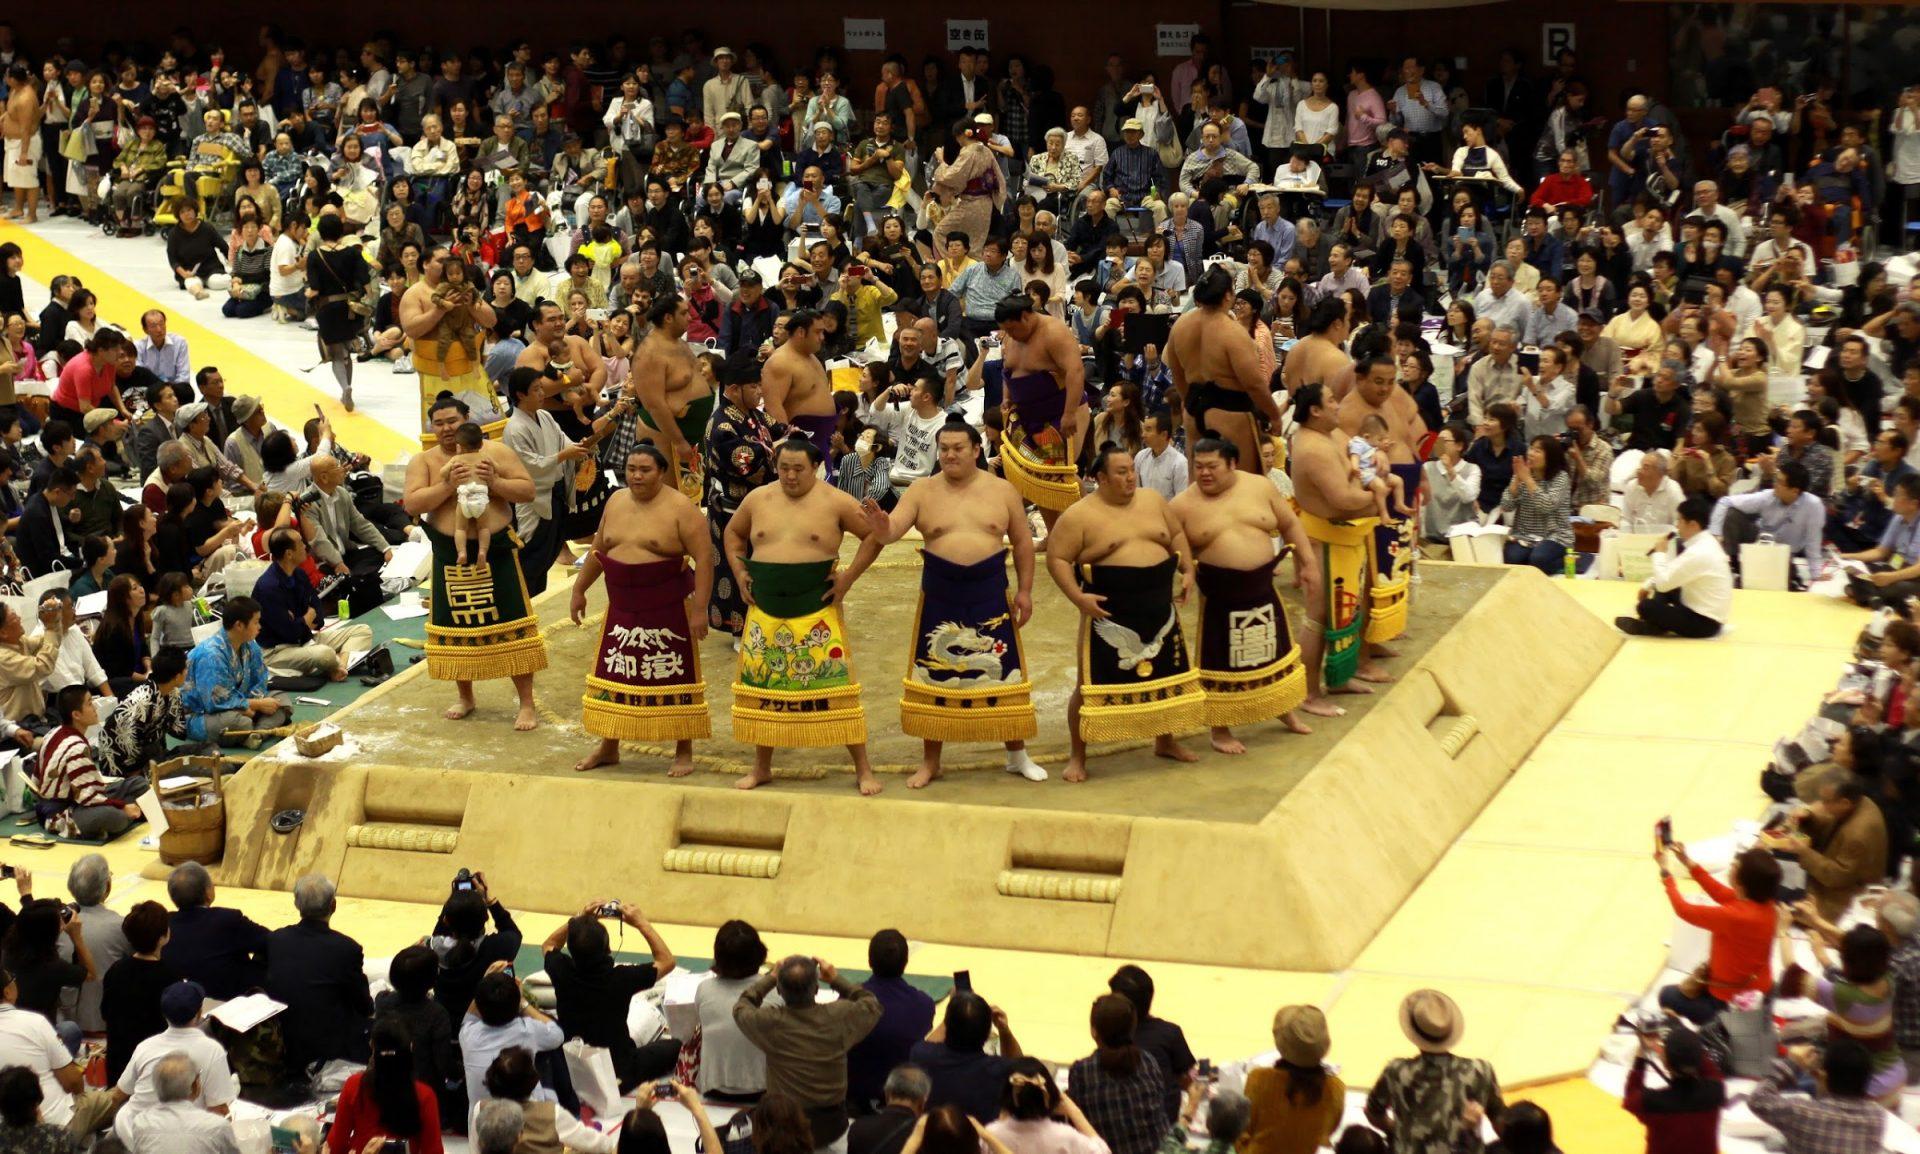 Dzień 6: Kyoto – zawody sumo i lasek bambusowy Arashiyama